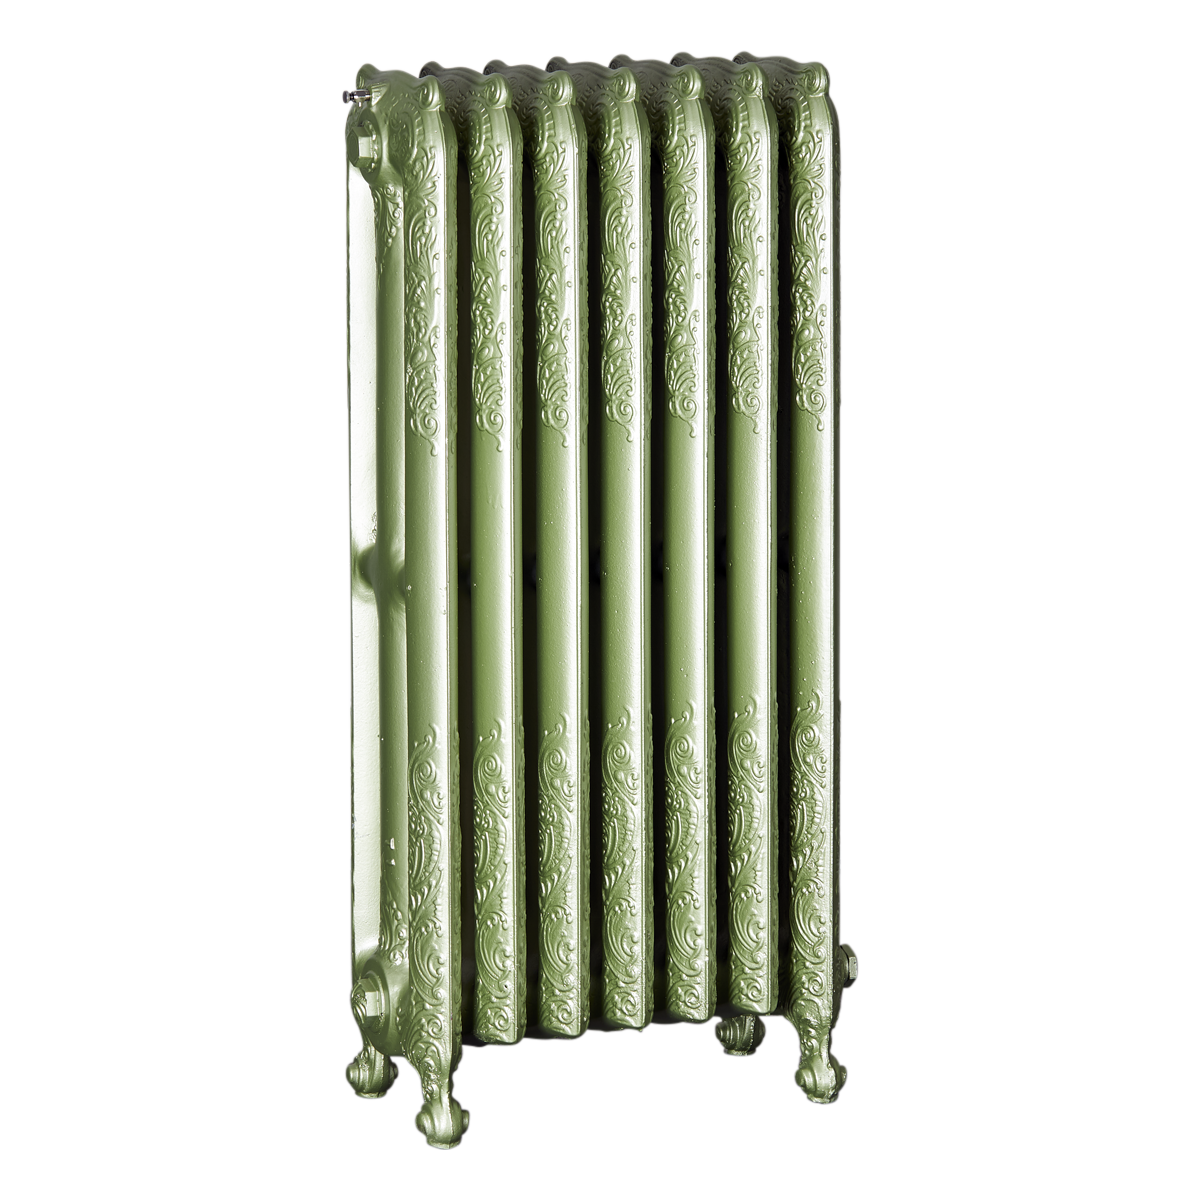 Ironworks Radiators Inc. refurbished cast iron radiator Darlington in Sage metallic